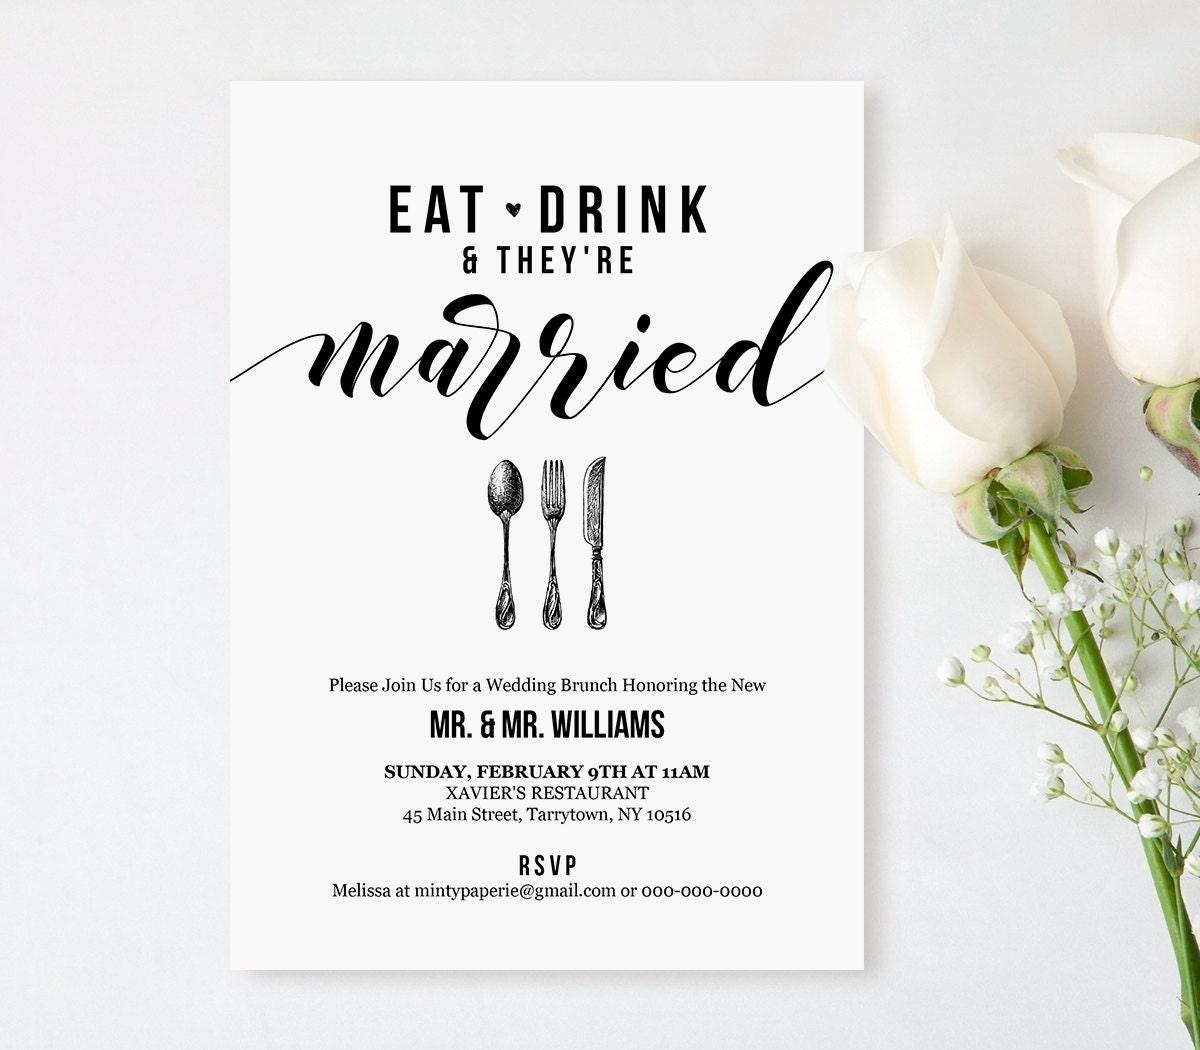 post wedding brunch invitation template, printable brunch invite, Wedding invitations